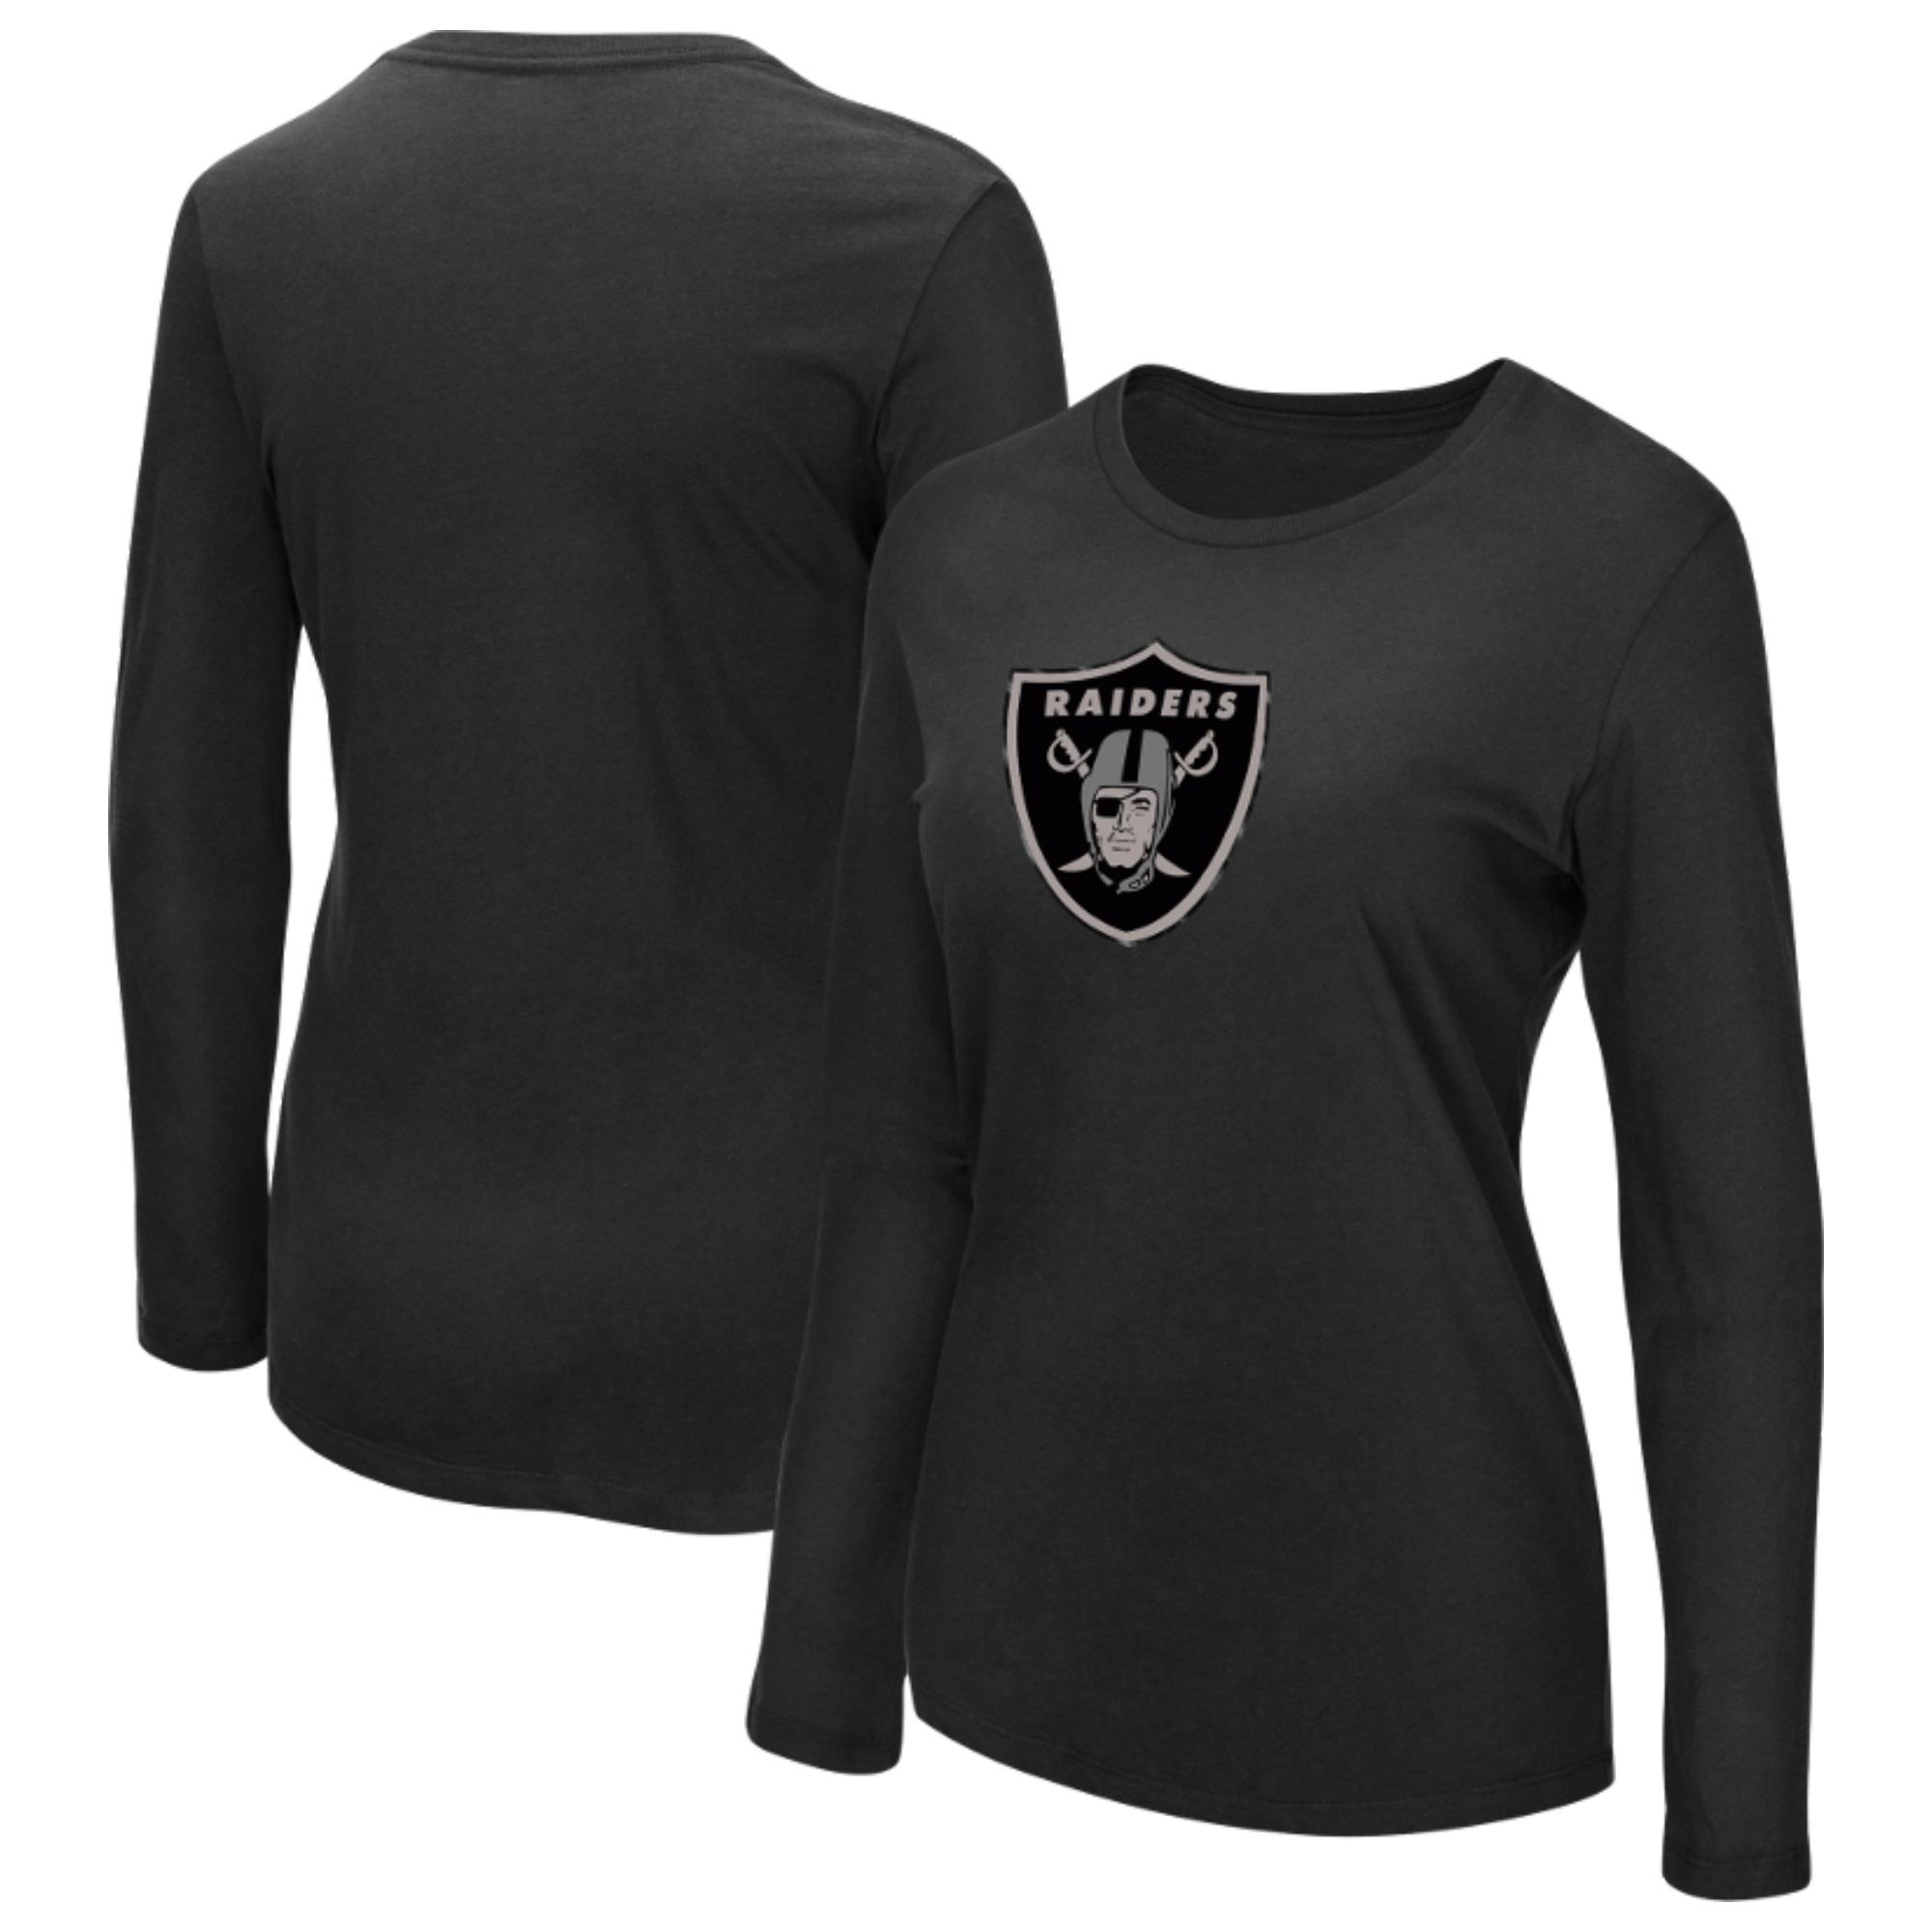 Oakland Raiders Majestic Women's My Team Long Sleeve T-Shirt - Black